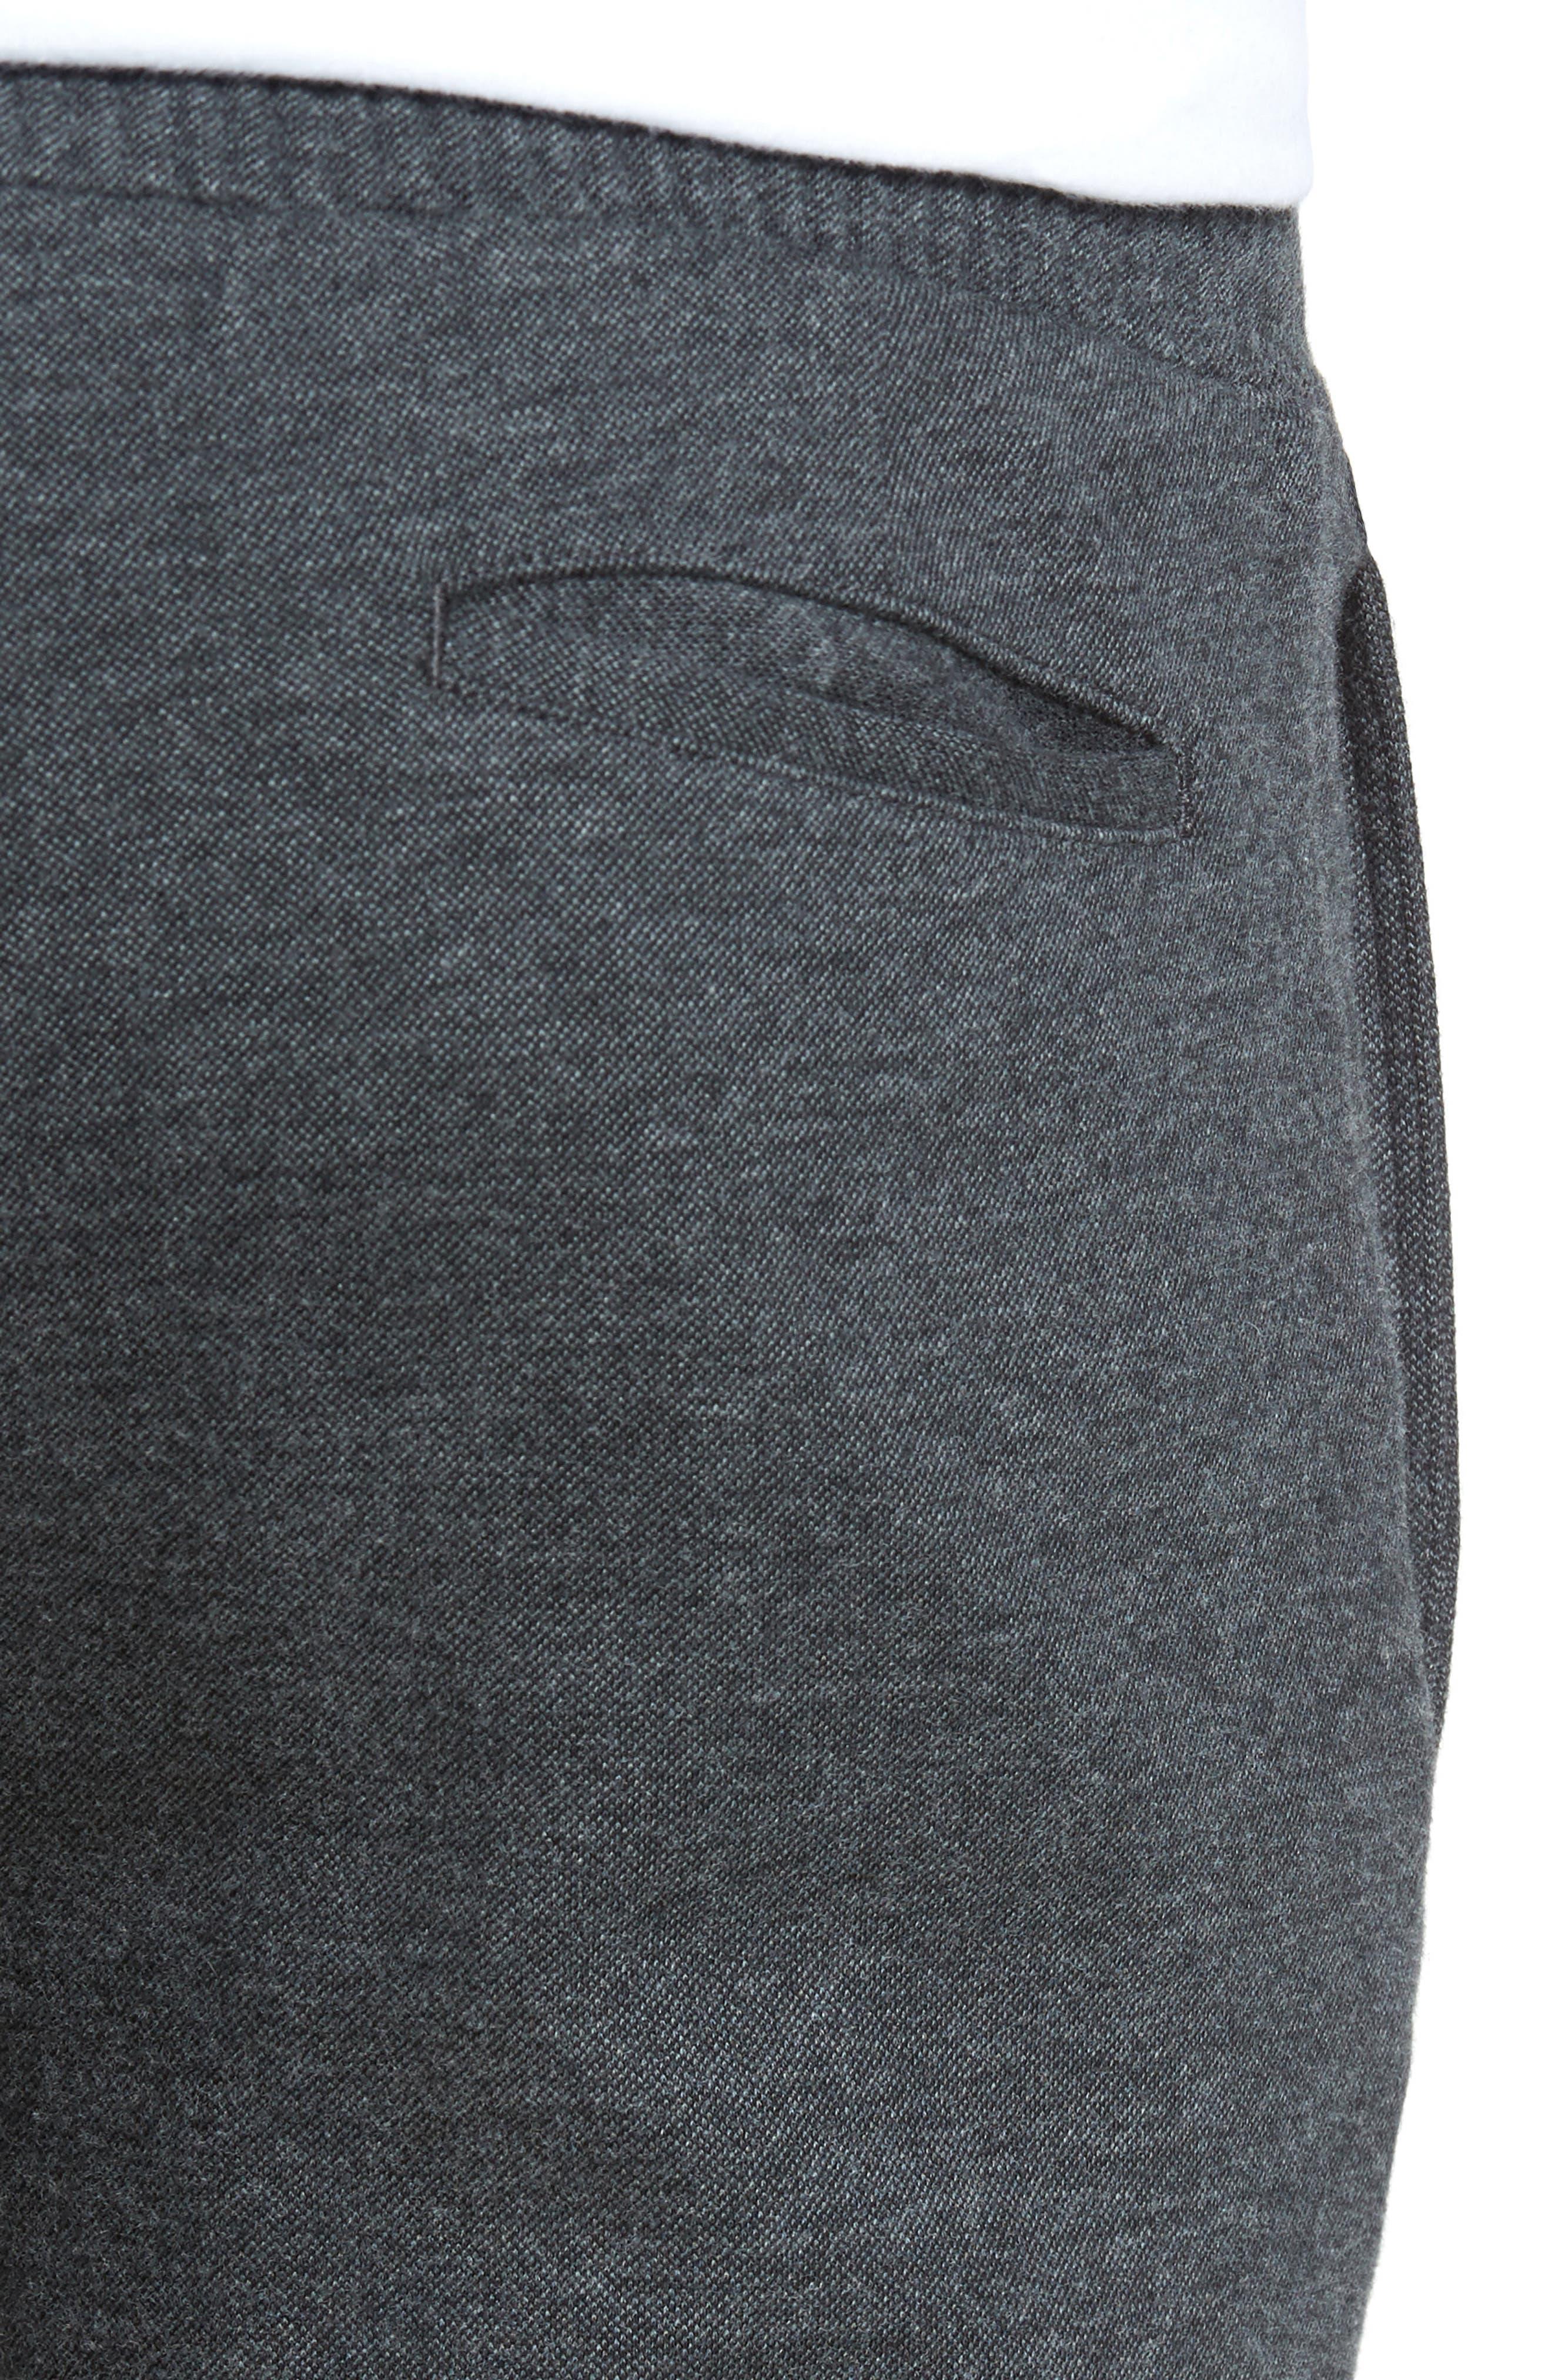 Jordan Flat Front Cotton Jogger Trousers,                             Alternate thumbnail 4, color,                             Medium Grey